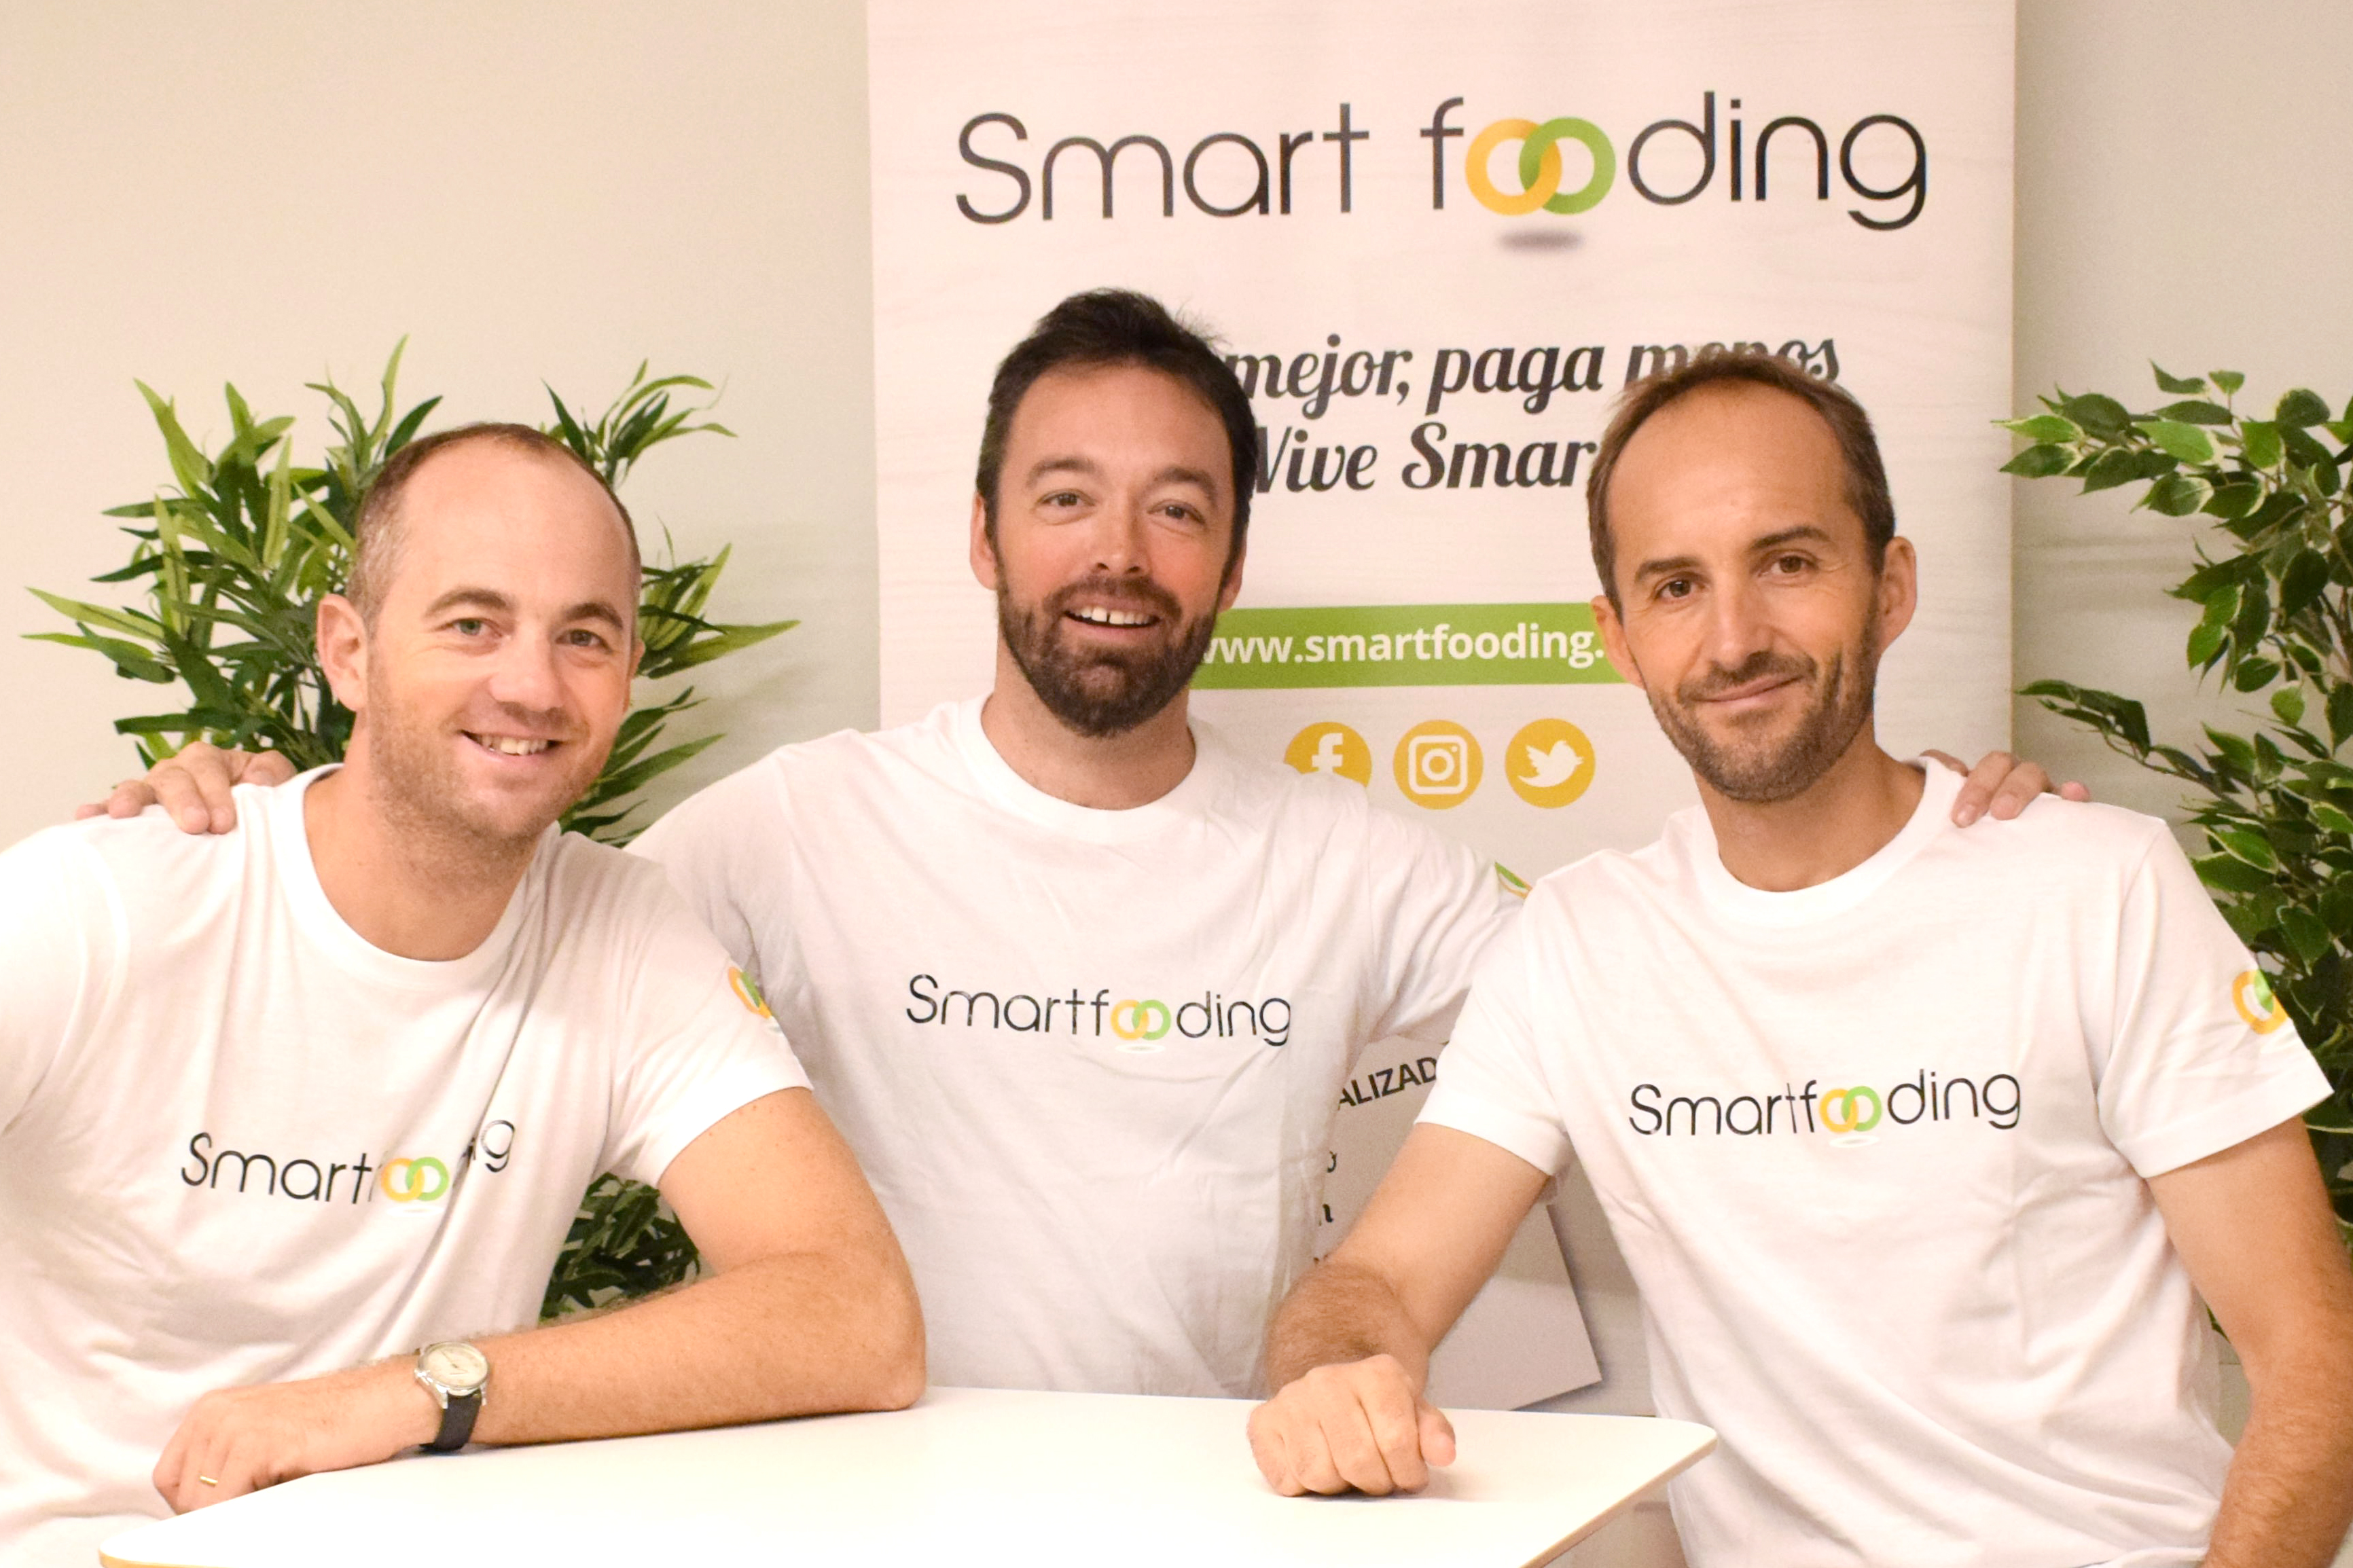 Fondateurs smartfooding